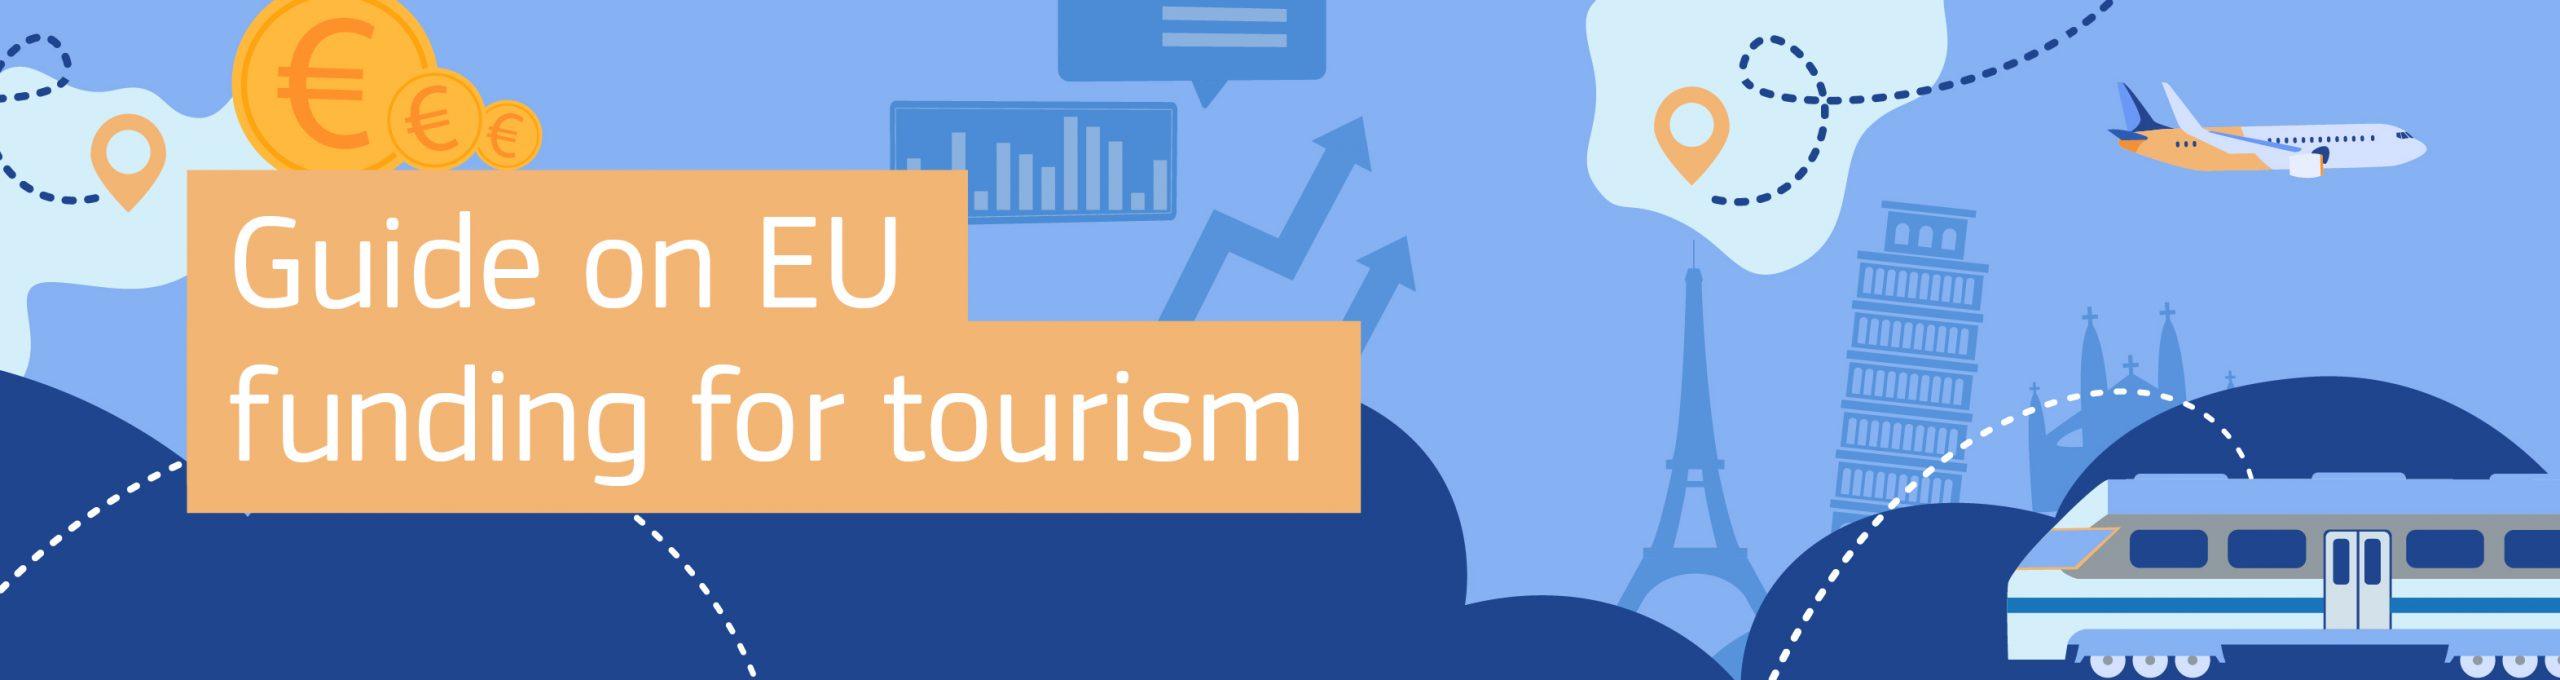 financovanie turizmu